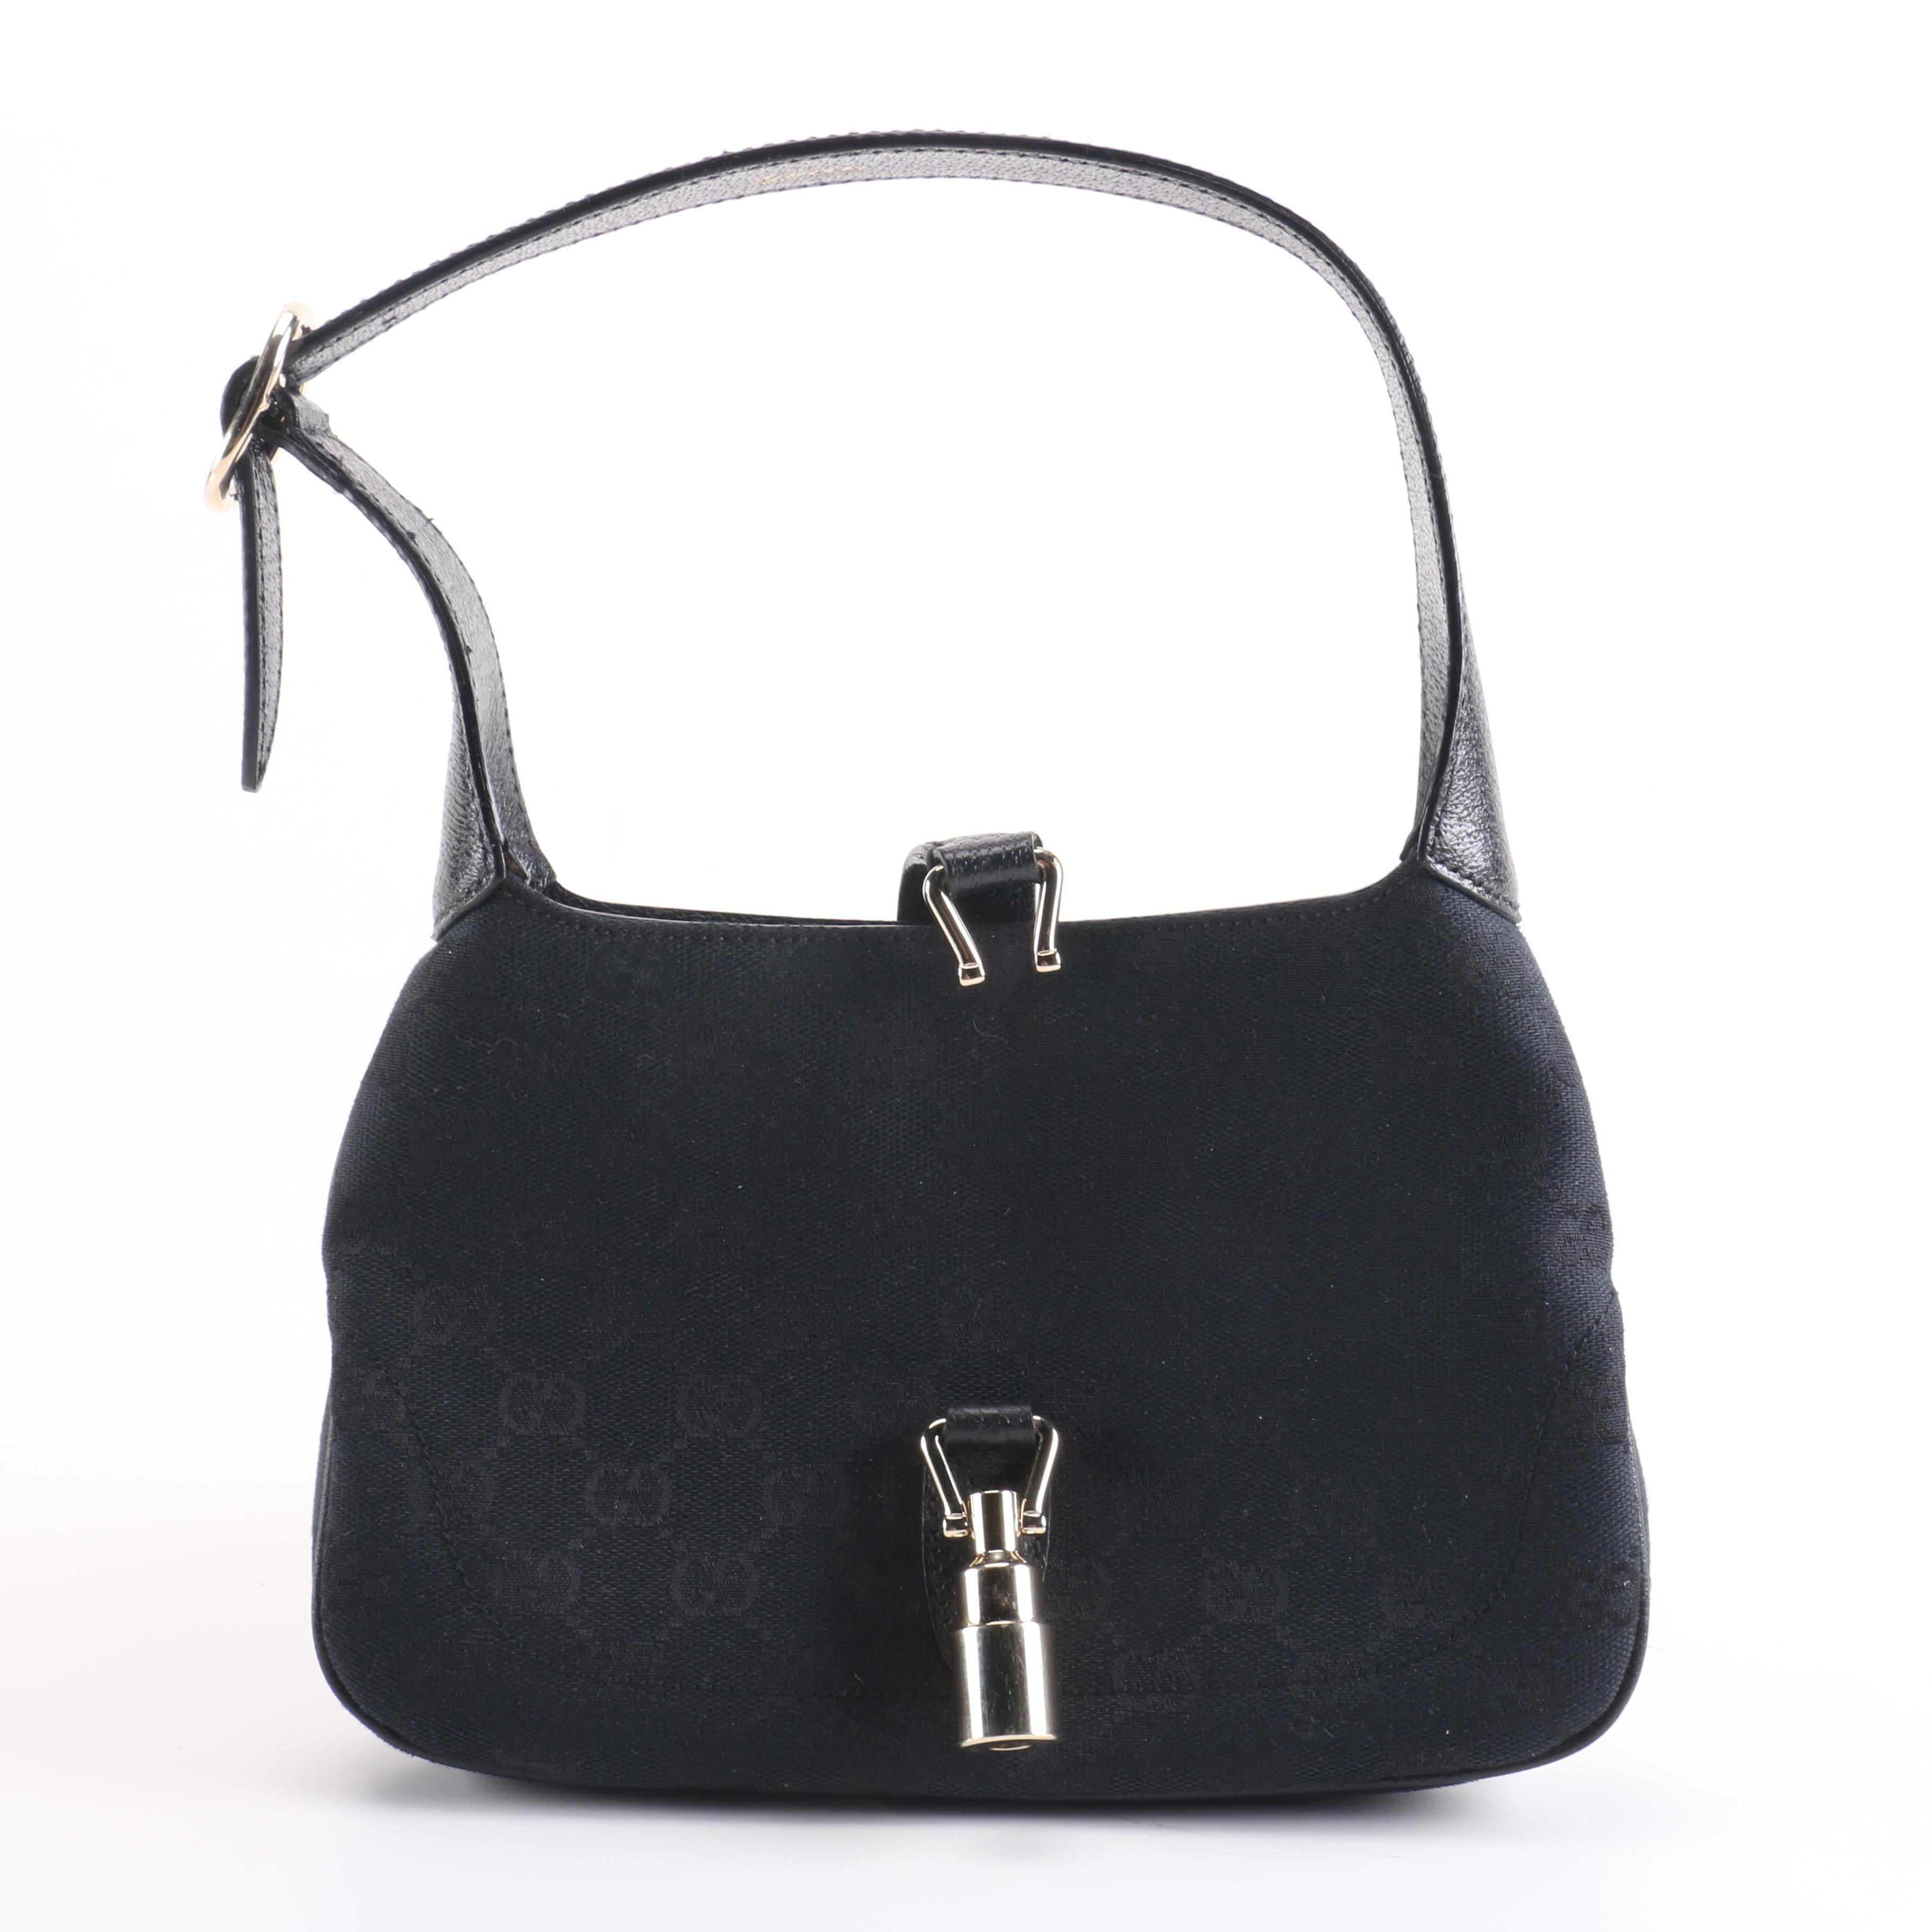 Gucci Black Canvas Handbag